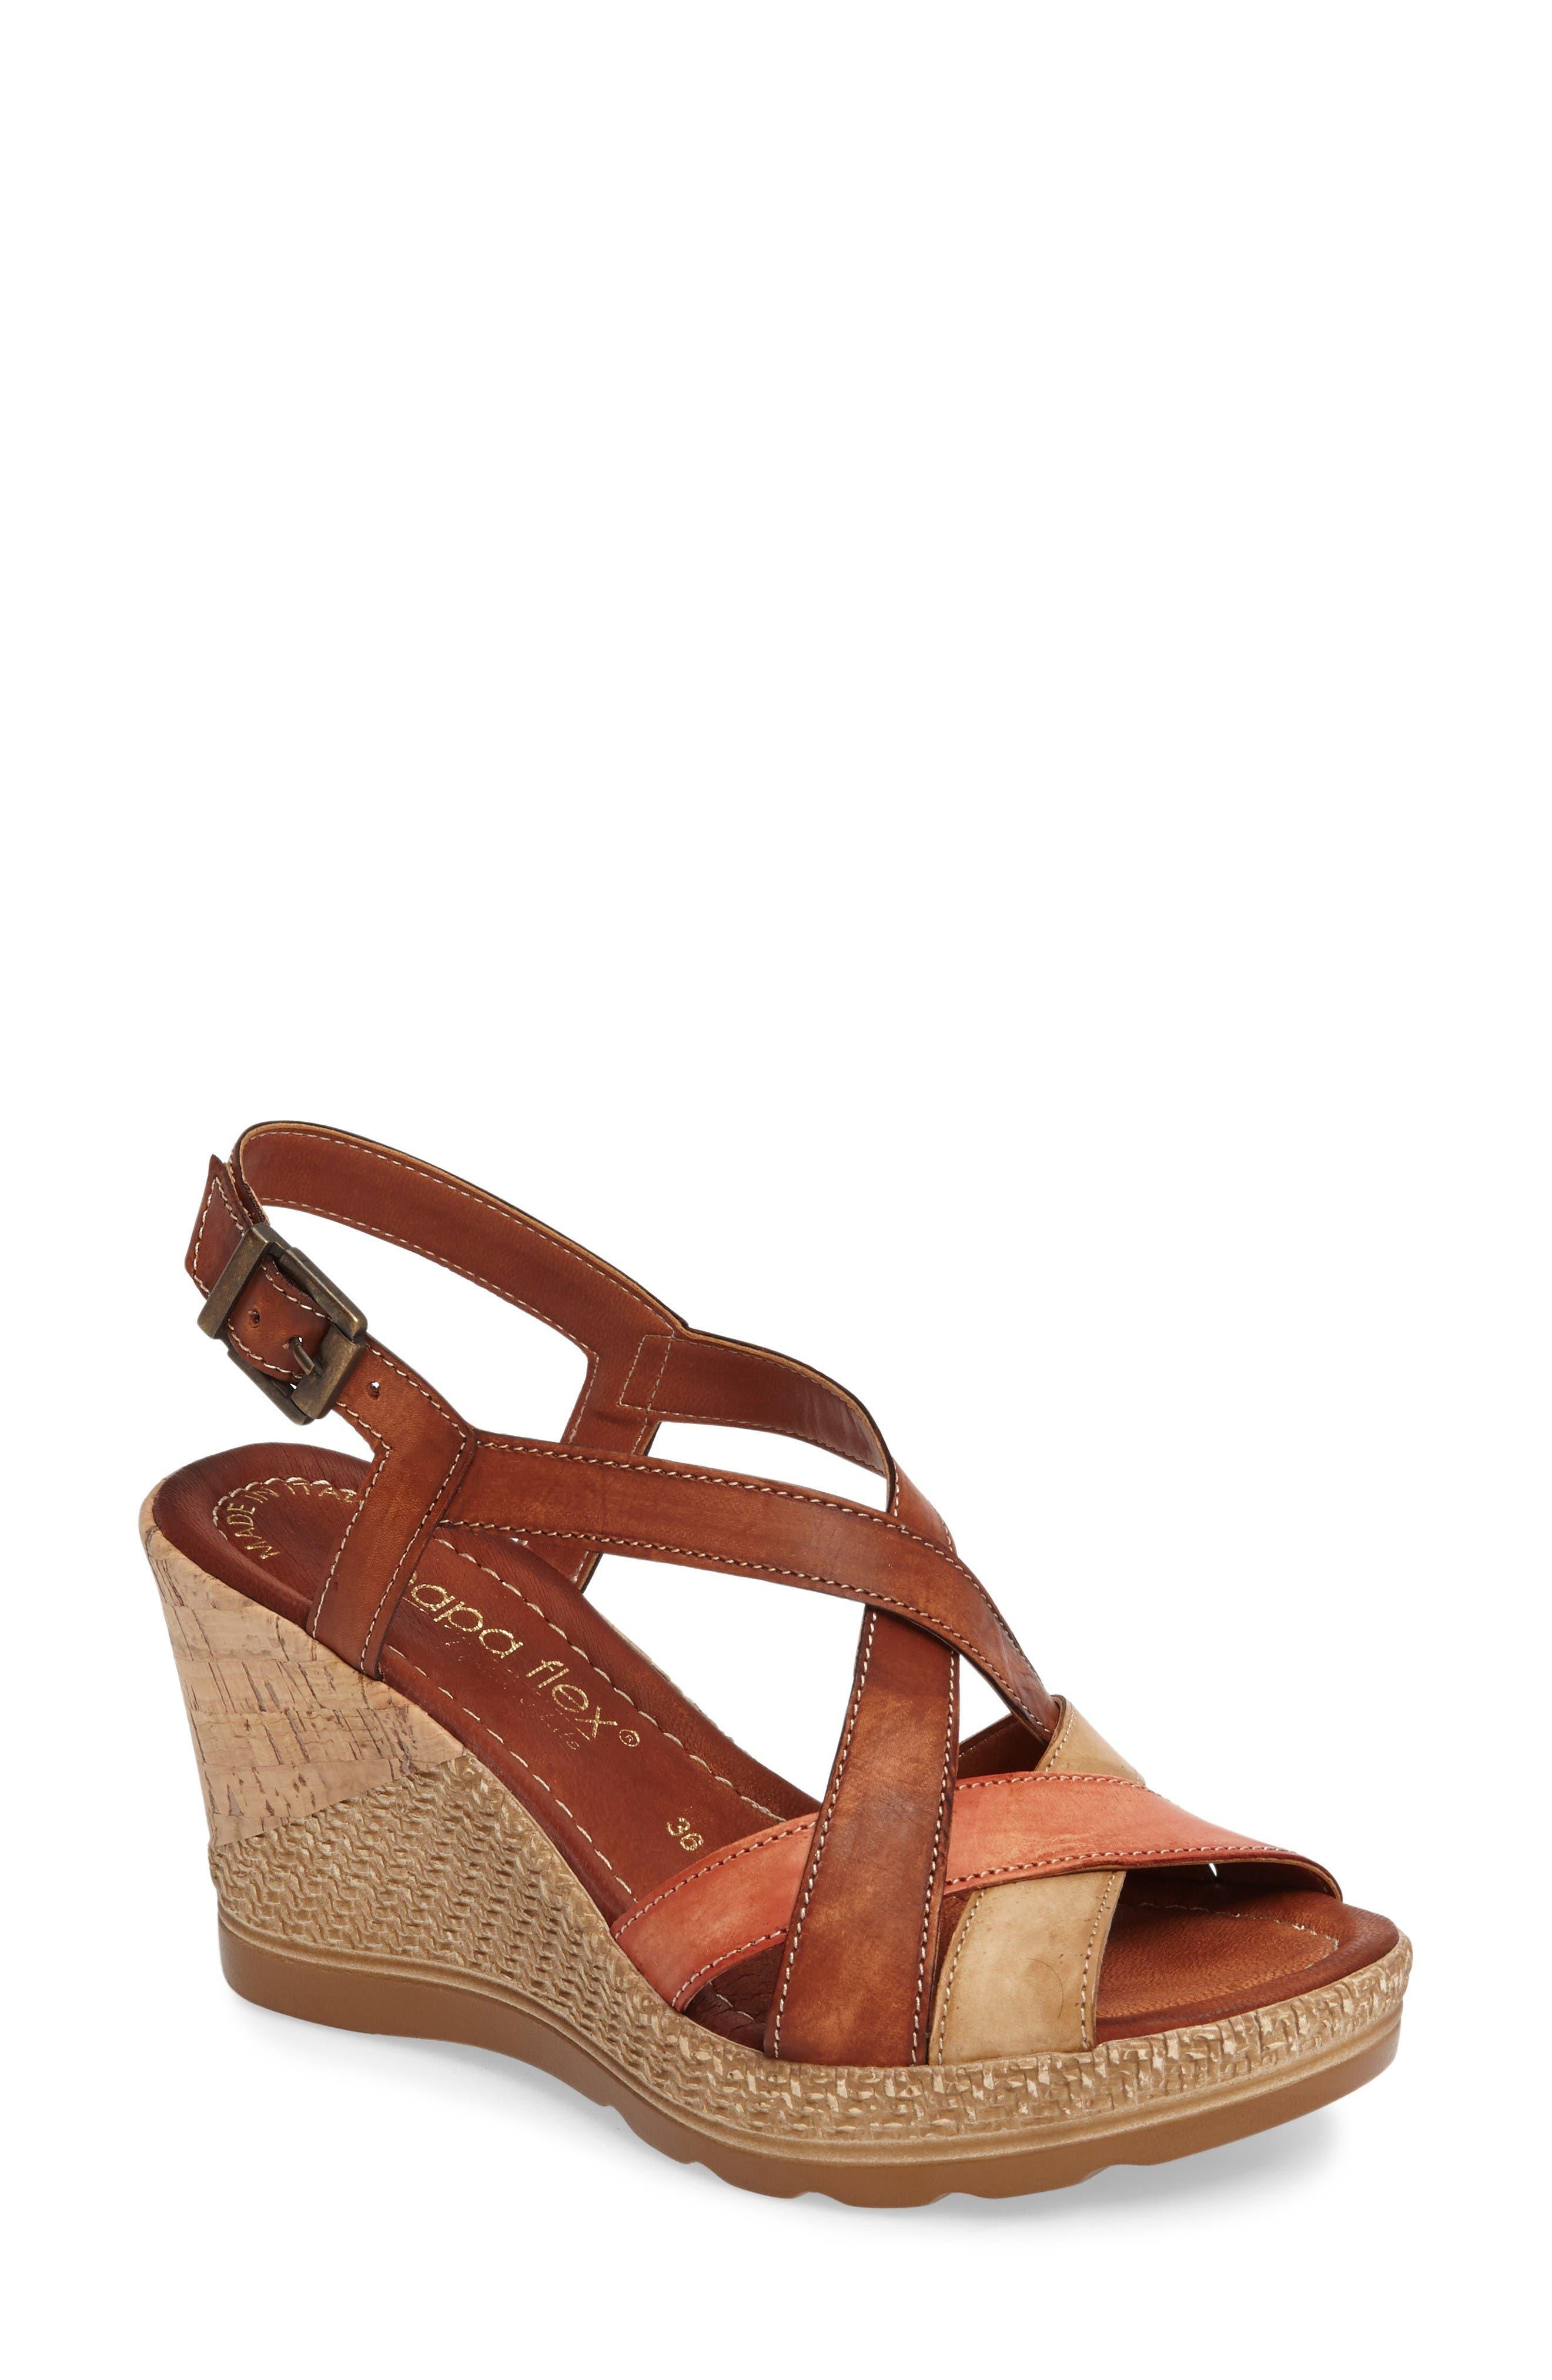 Modena Wedge Sandal,                             Main thumbnail 1, color,                             Cognac Leather